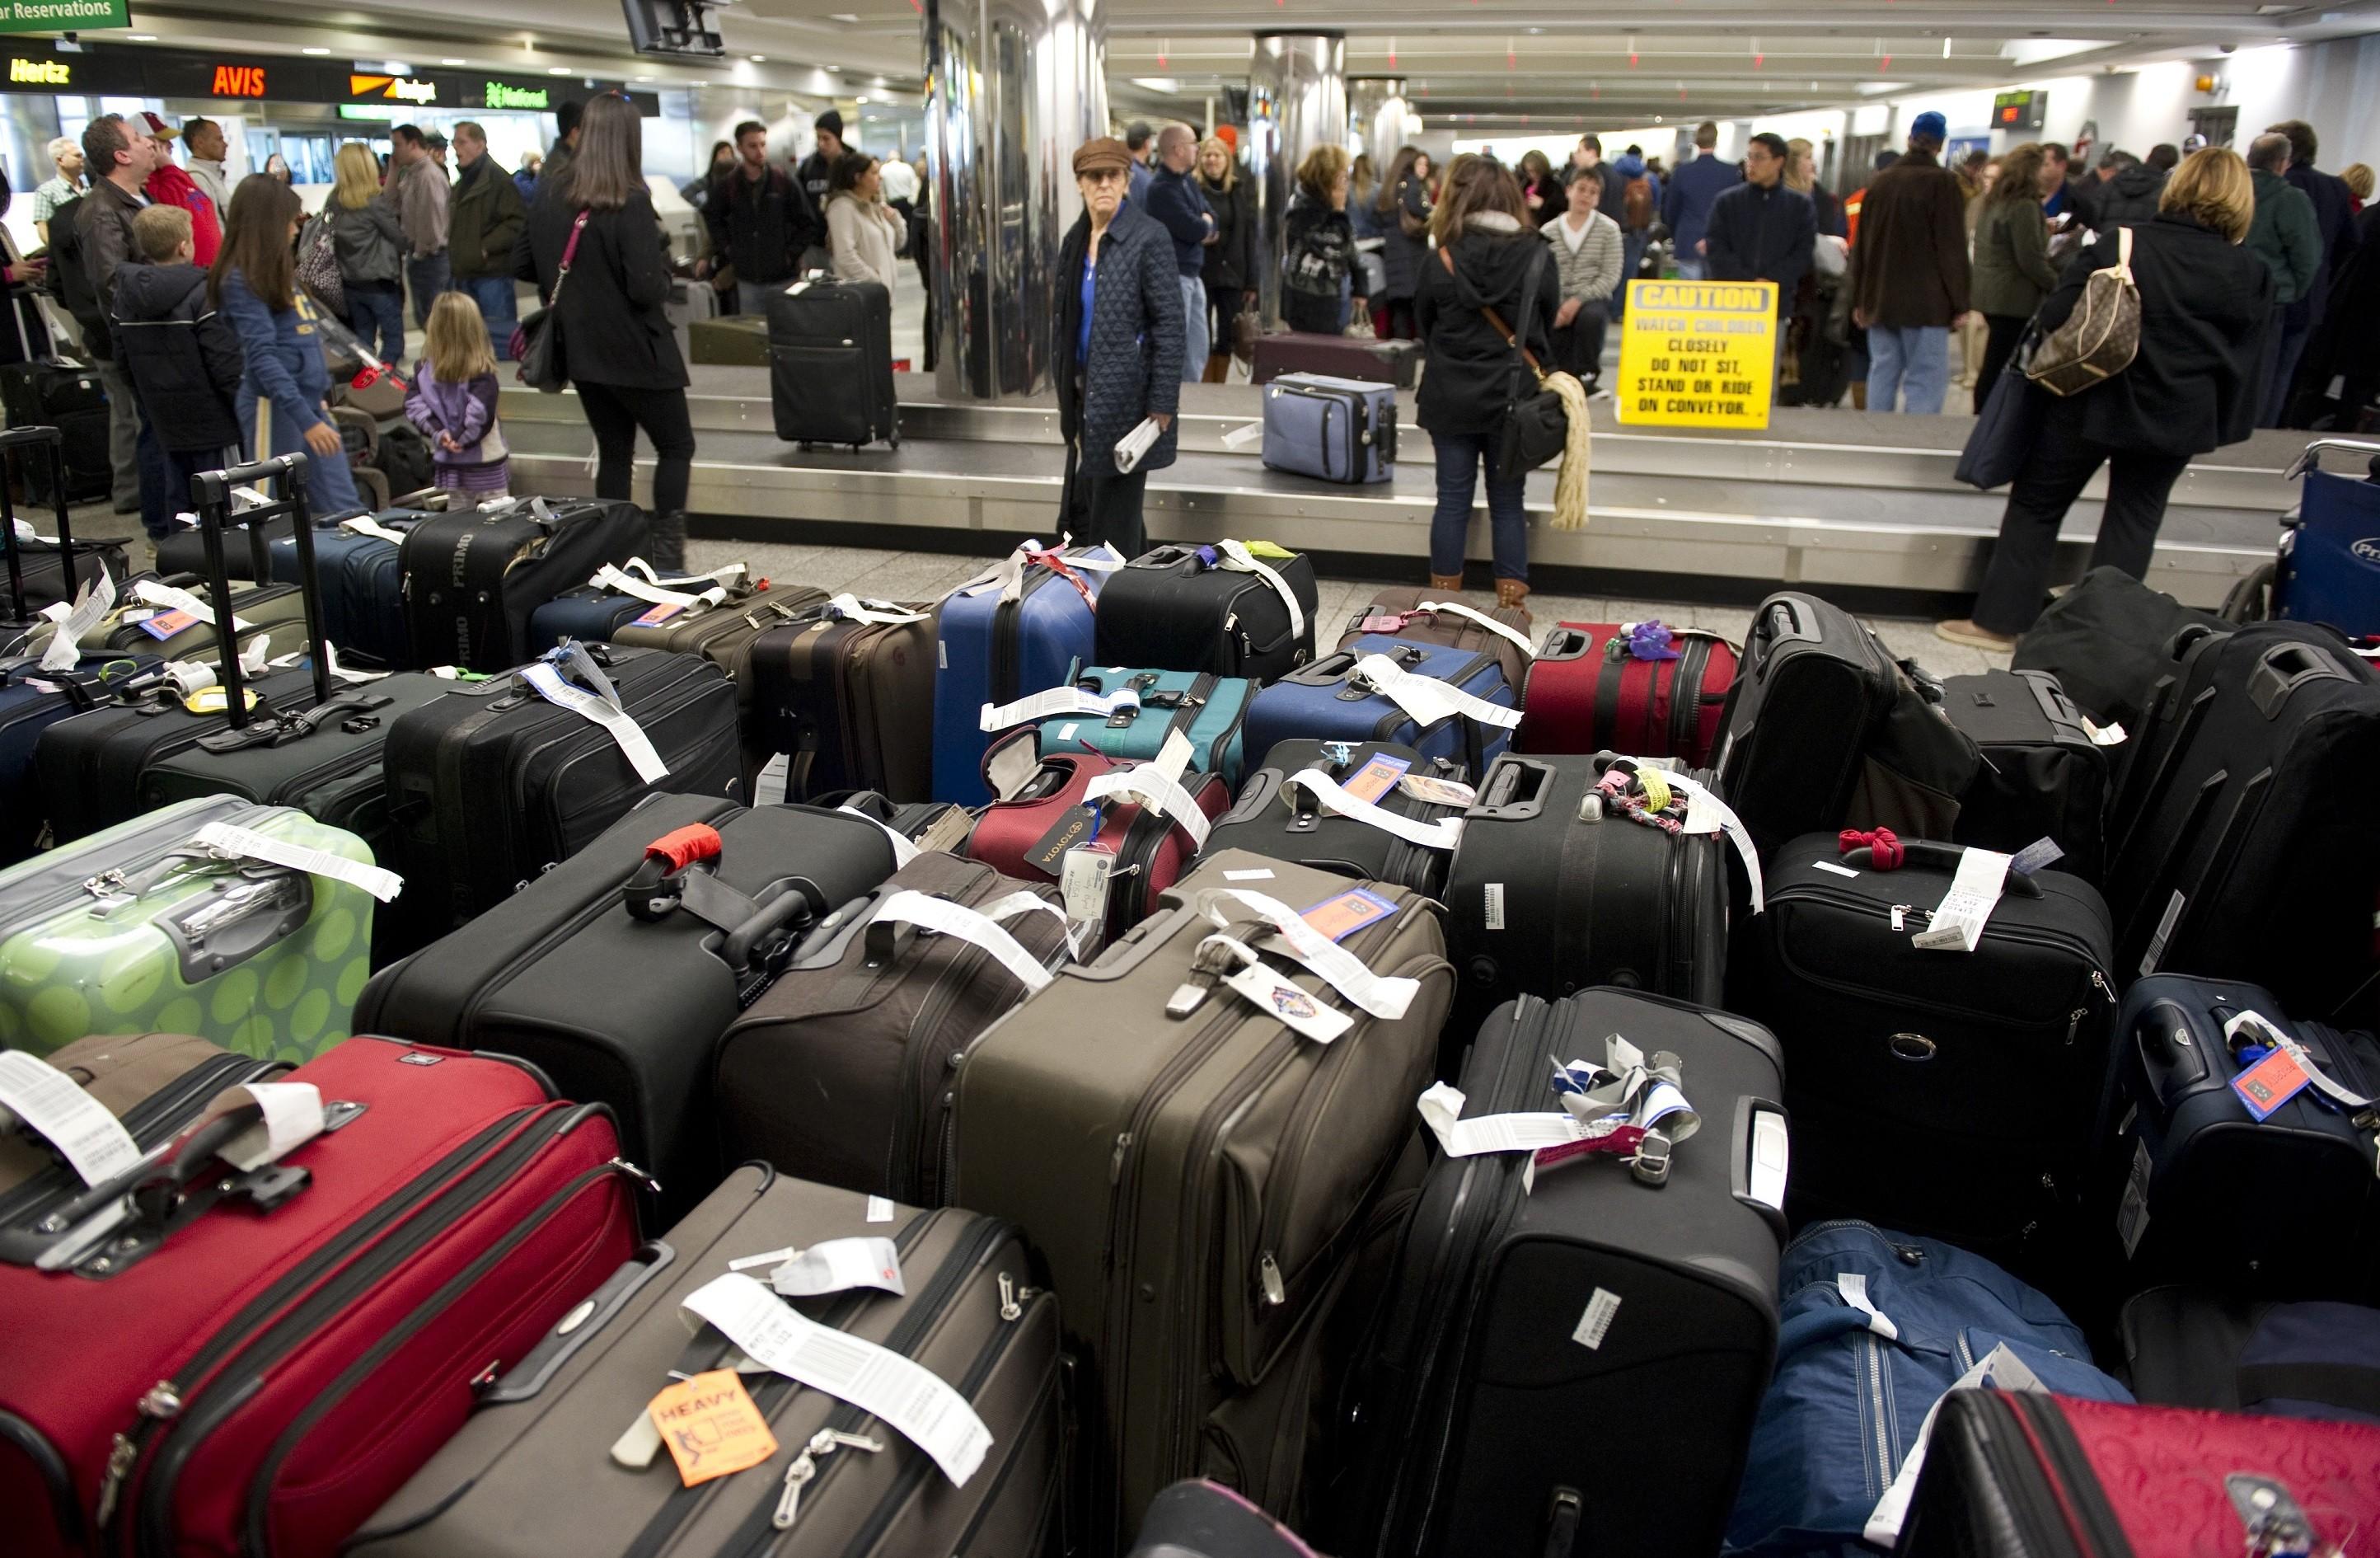 Unclaimed Luggage